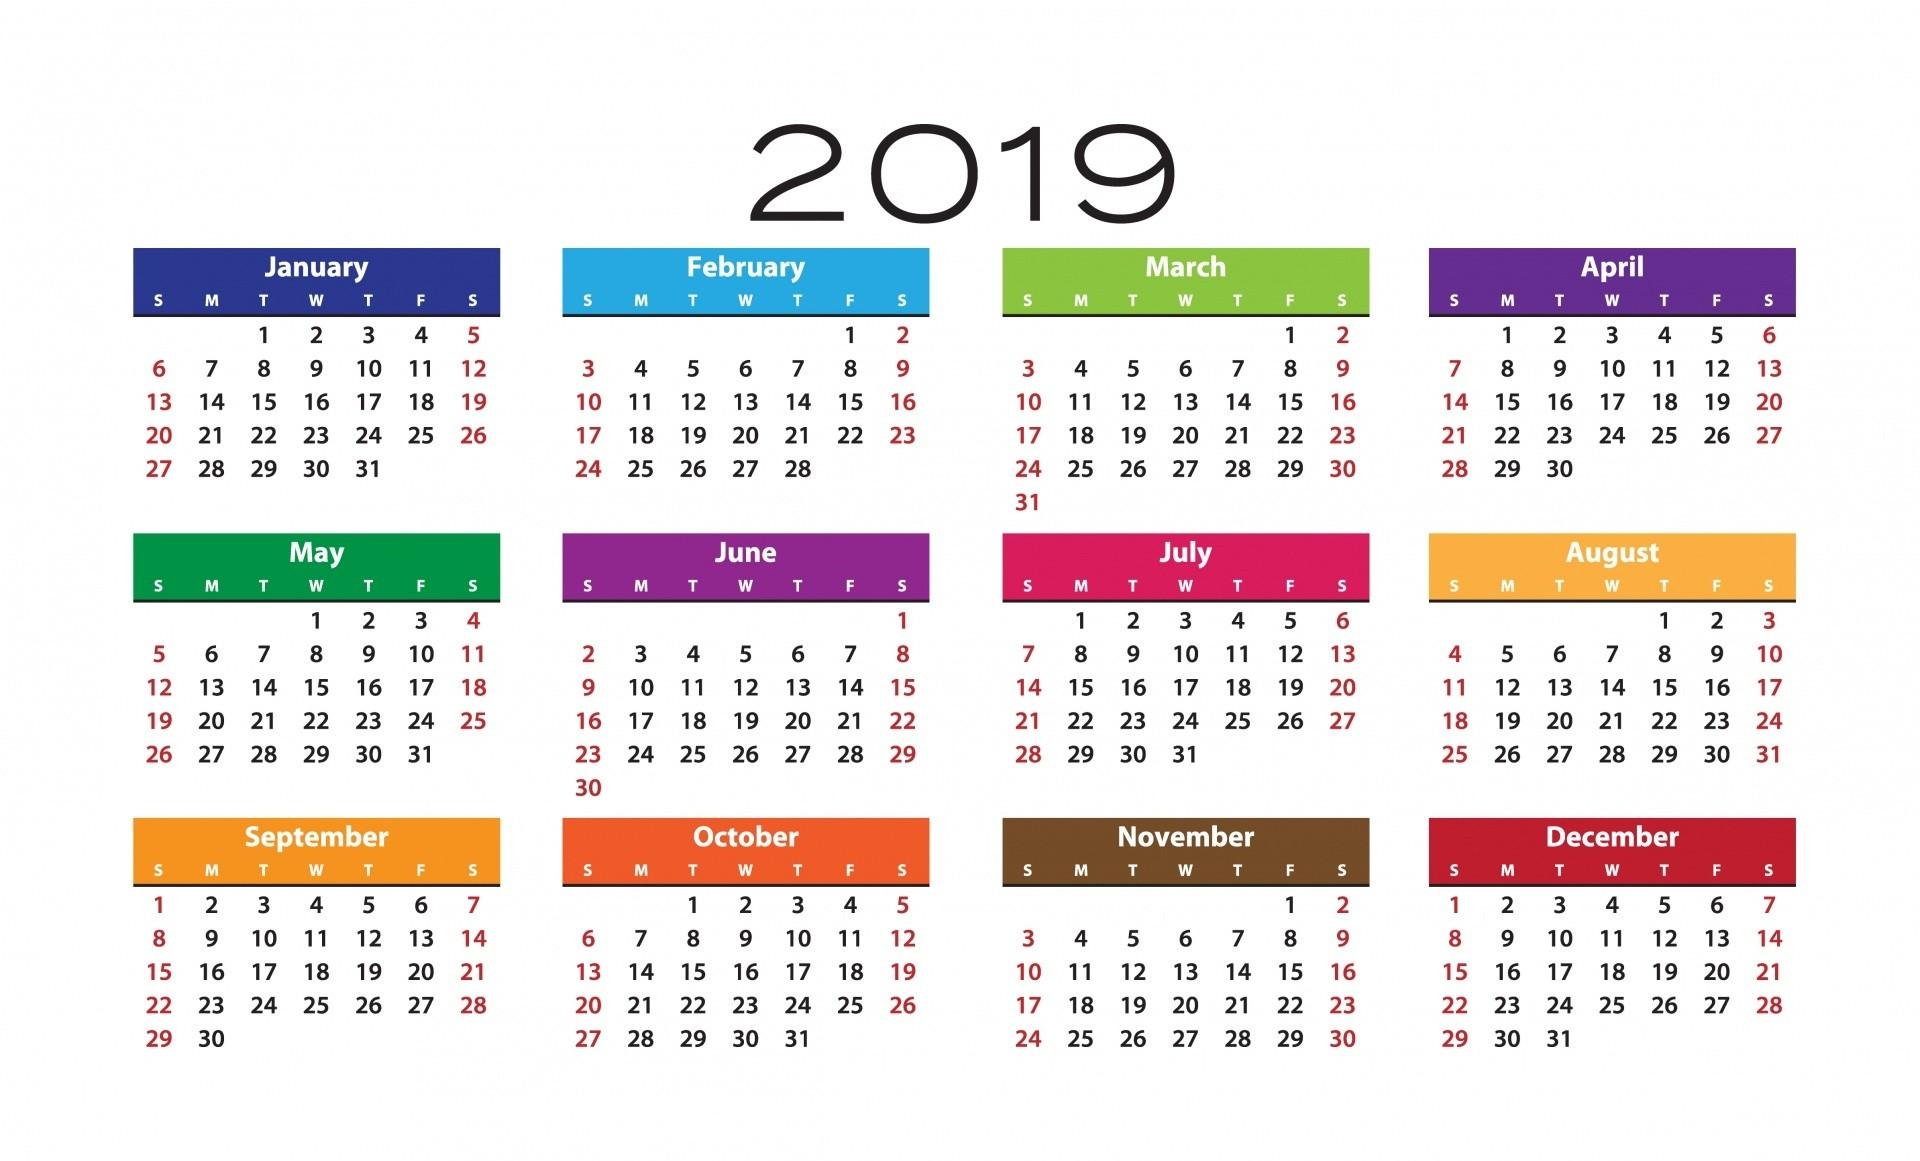 16/17 Fin Year Calendar Entries - Template Calendar Design  2021-19 Financial Year Dates